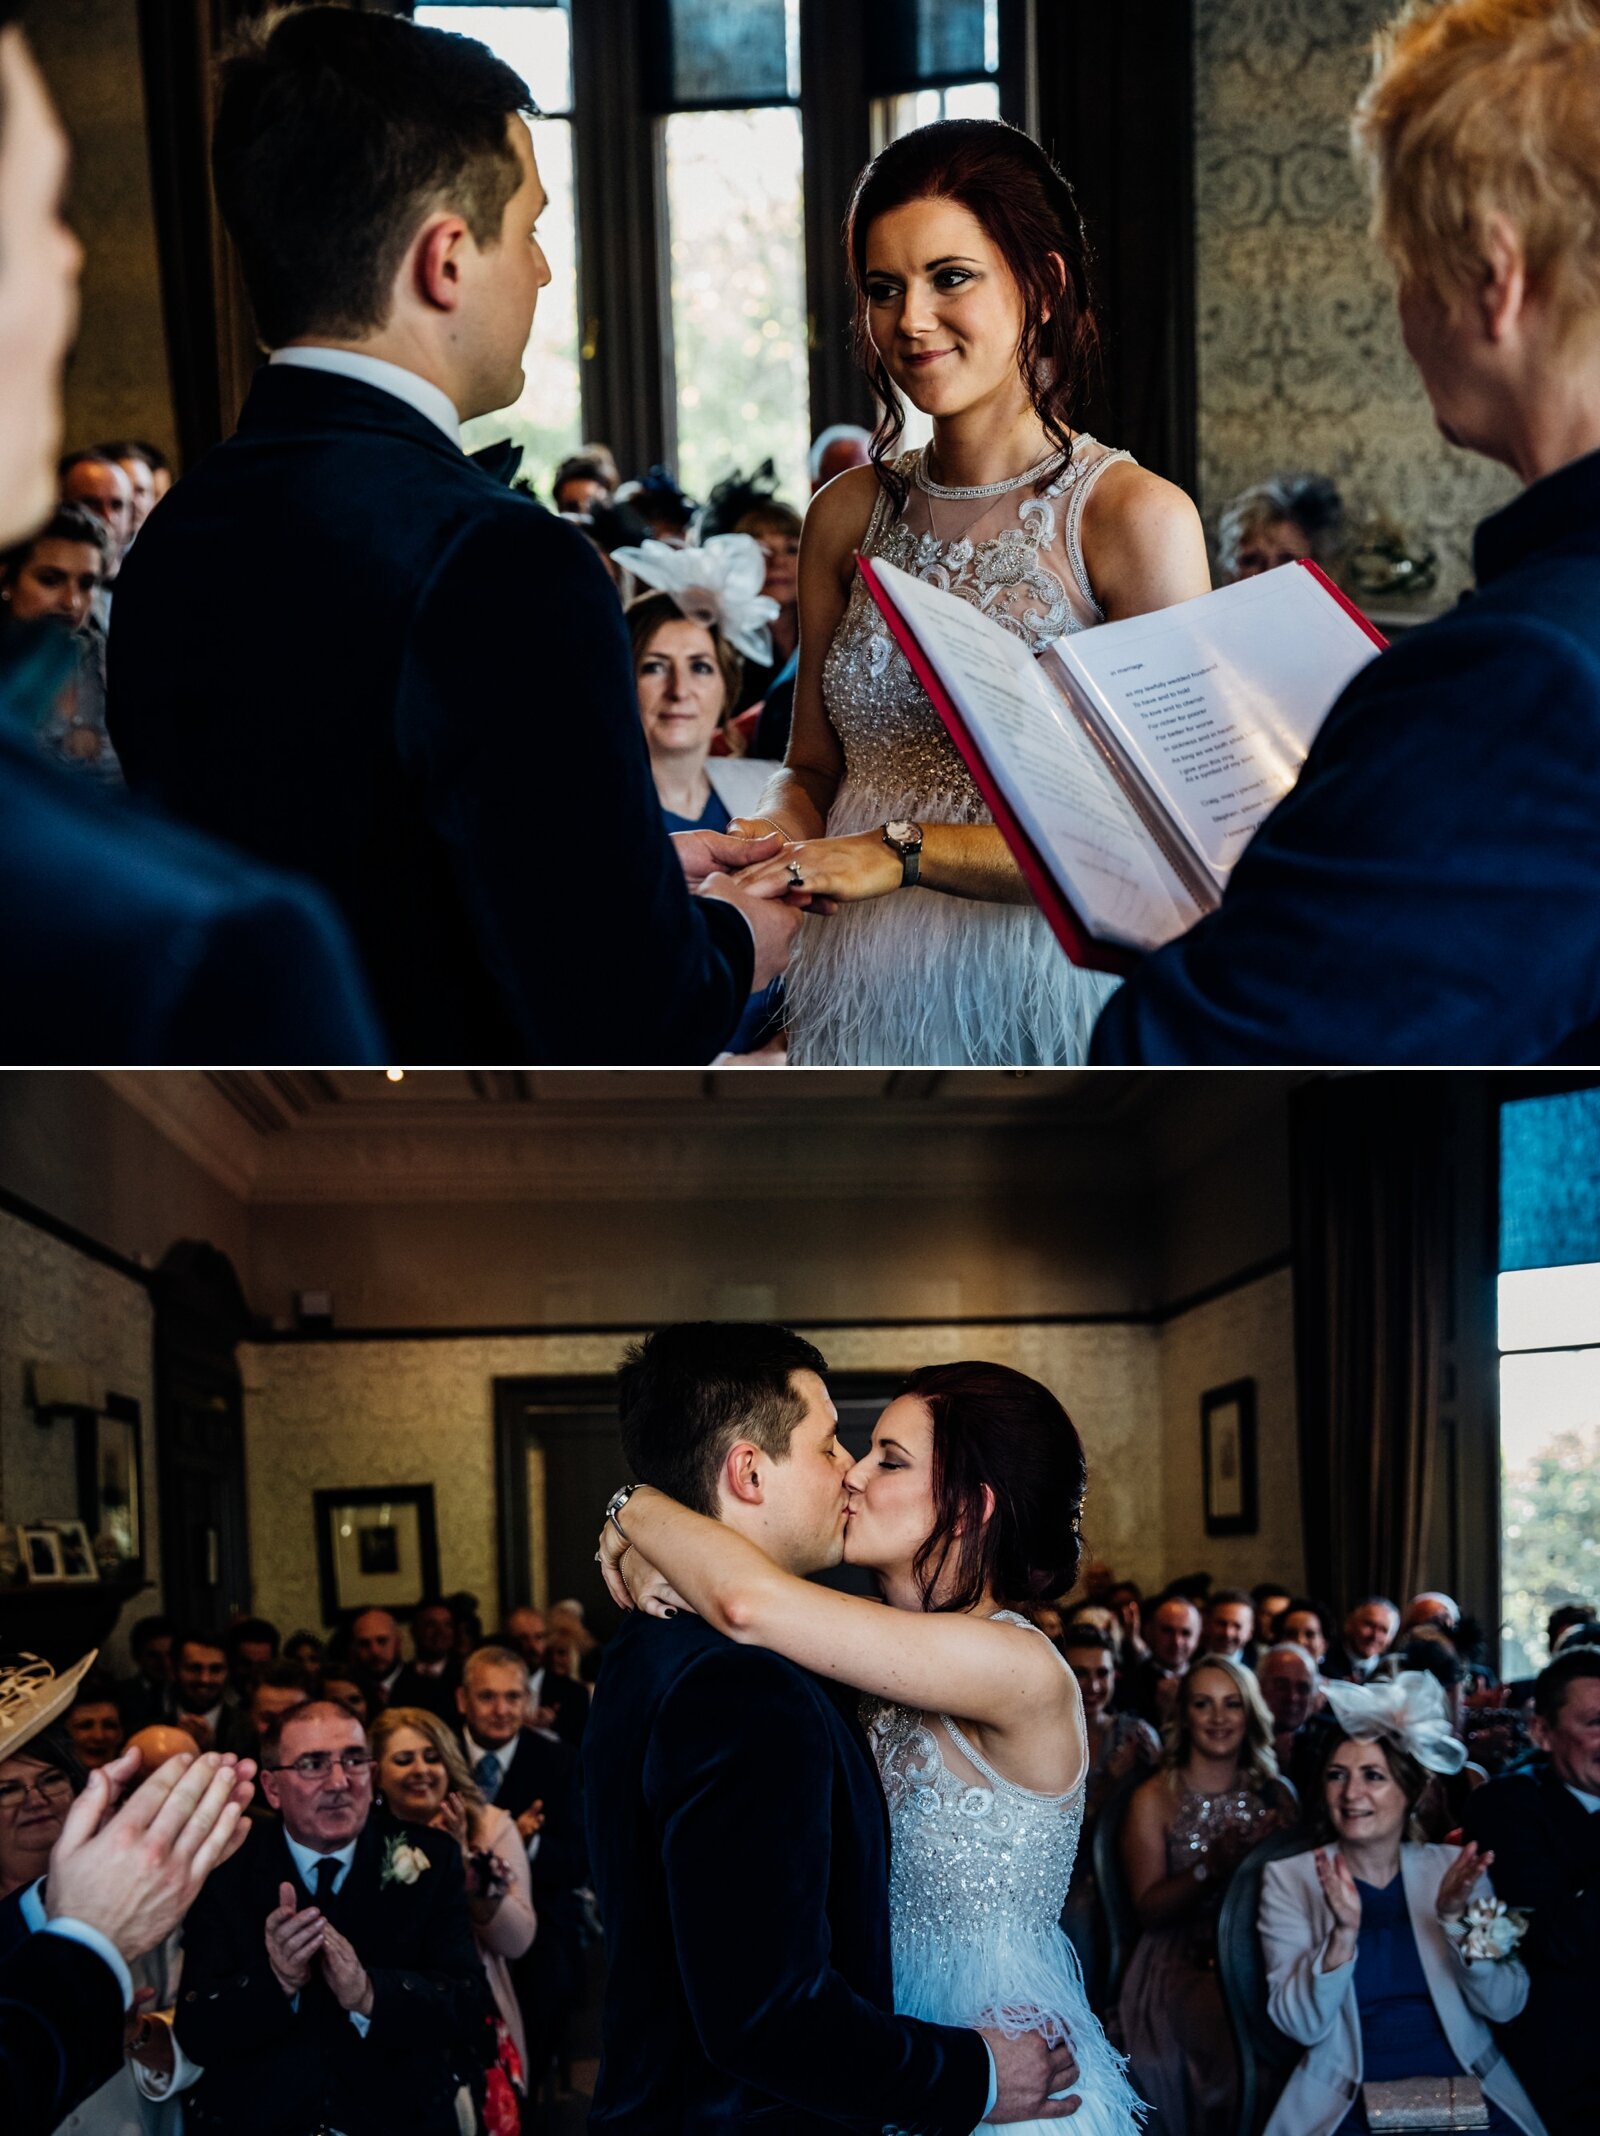 Andy&Szerdi-Photography_Ceremony_Elaine-Stephen-27.jpg